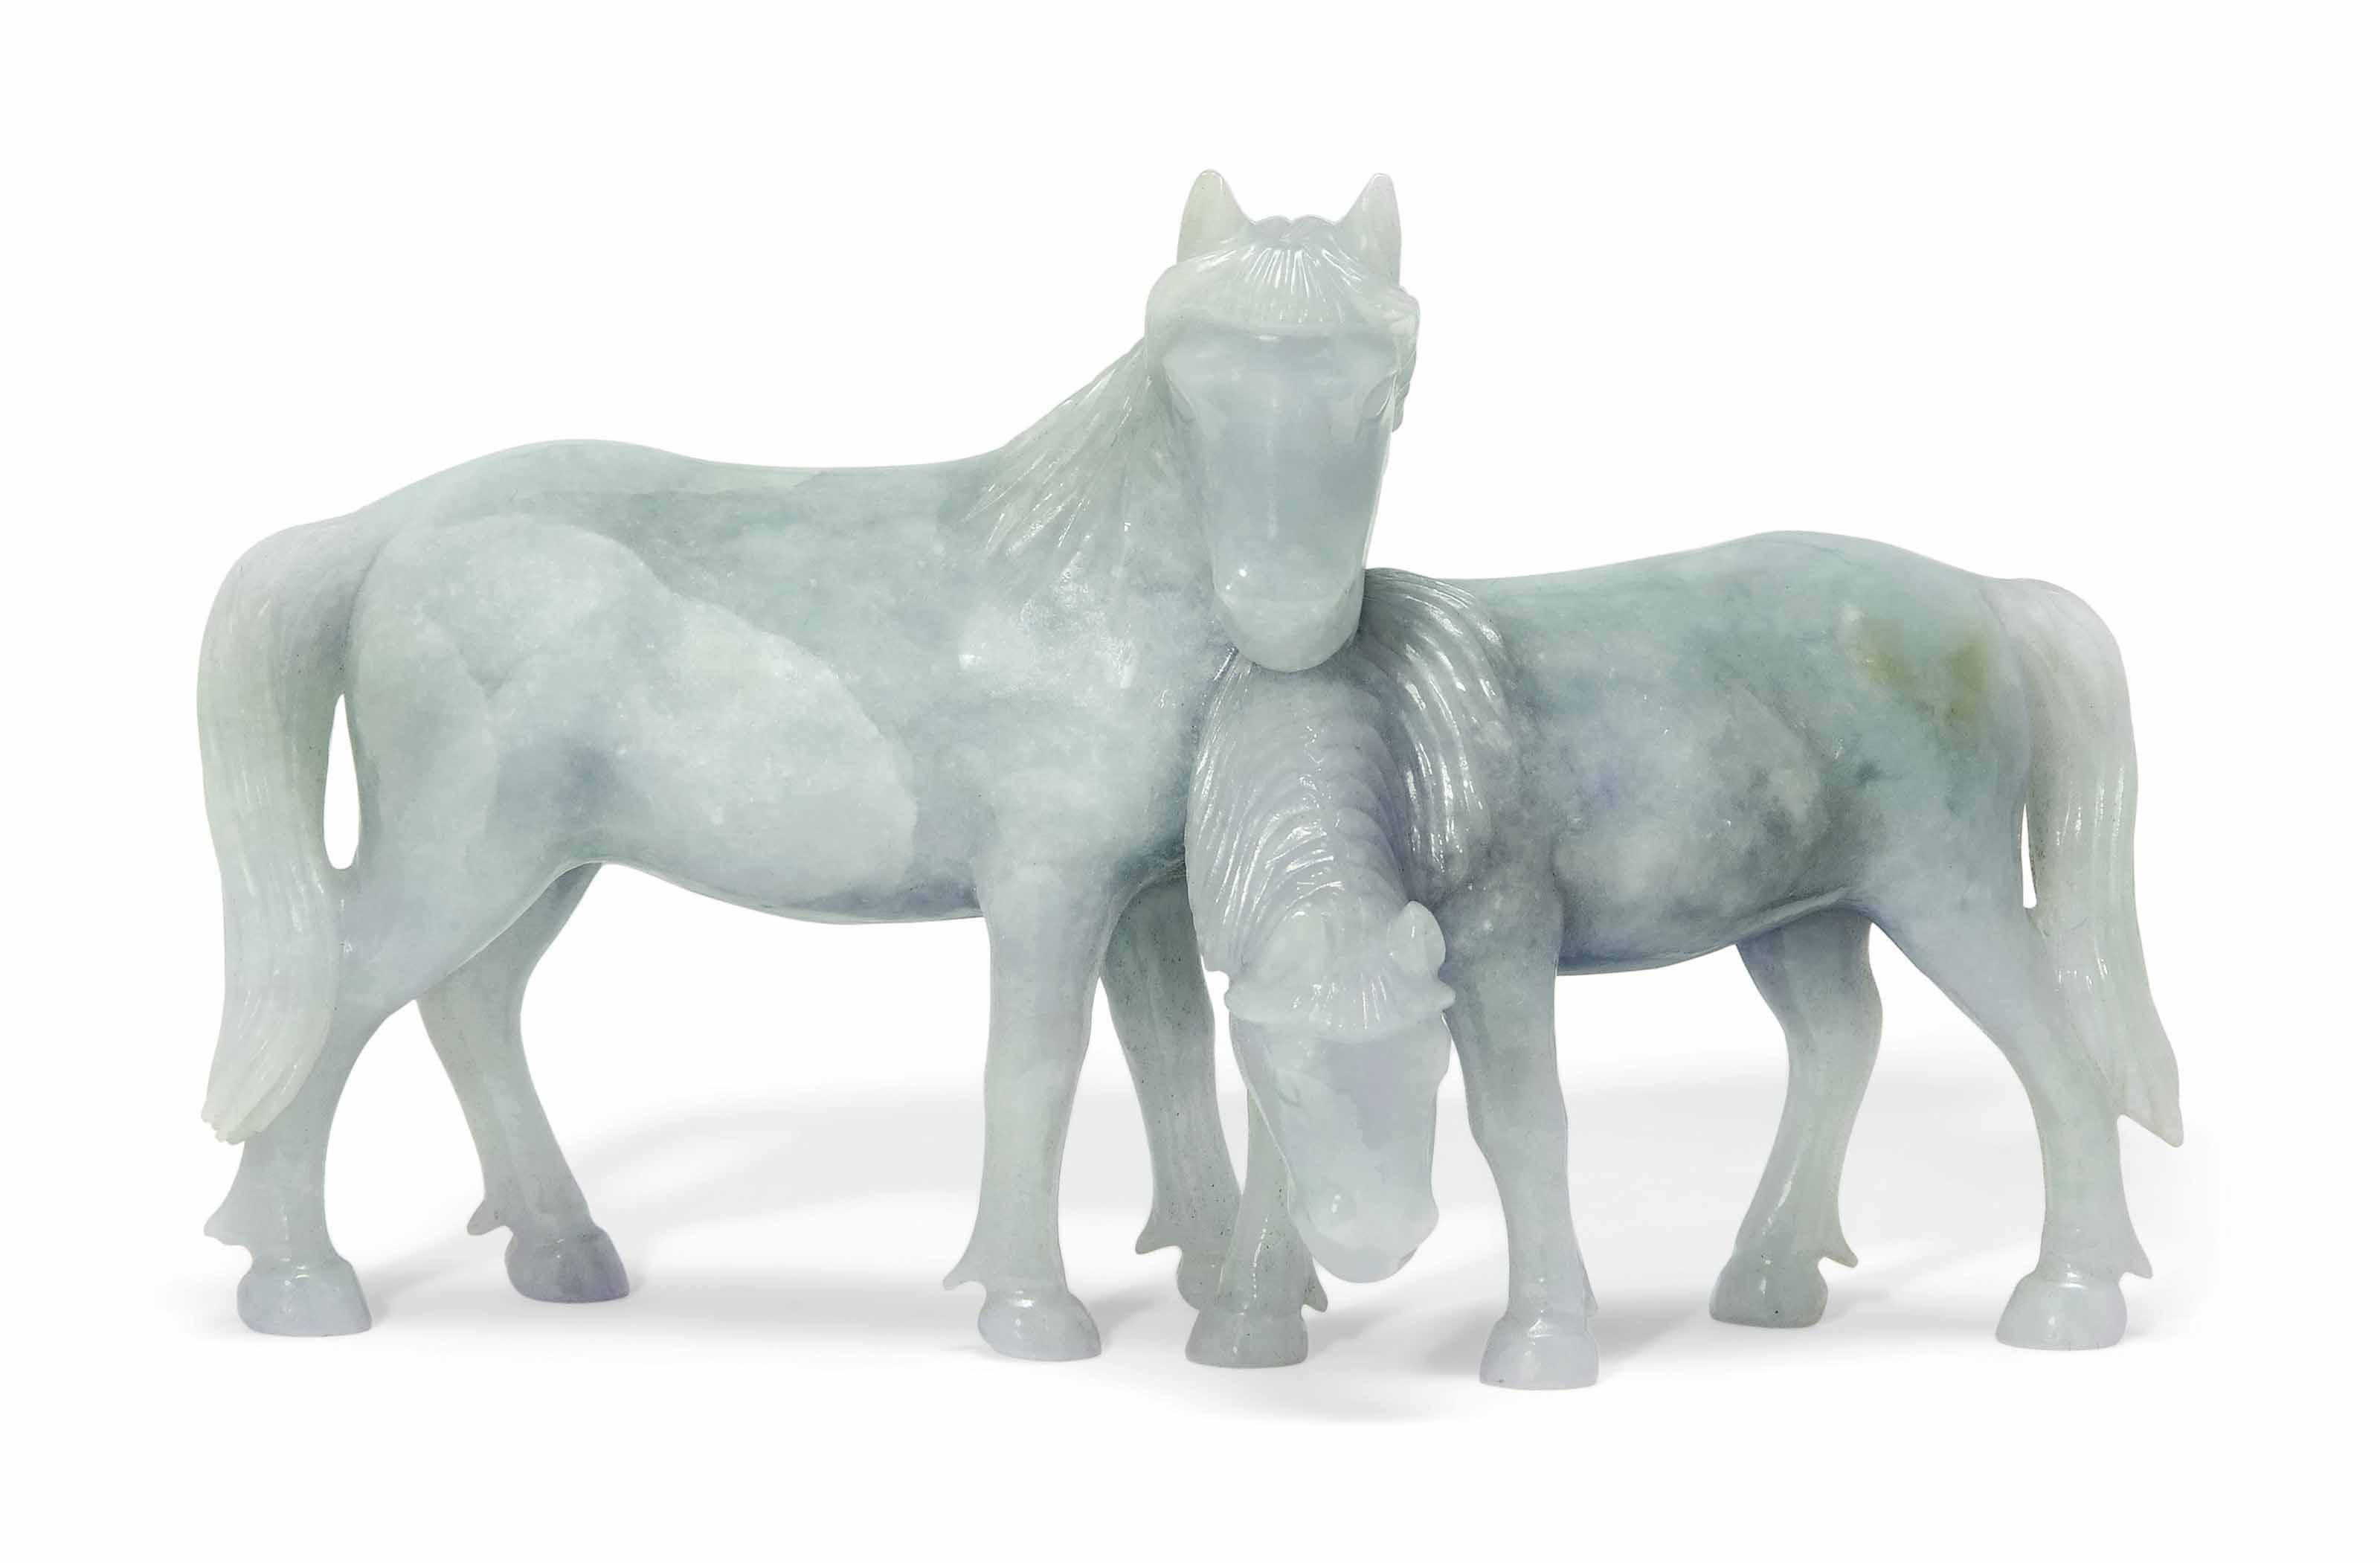 A JADEITE 'HORSE' GROUP